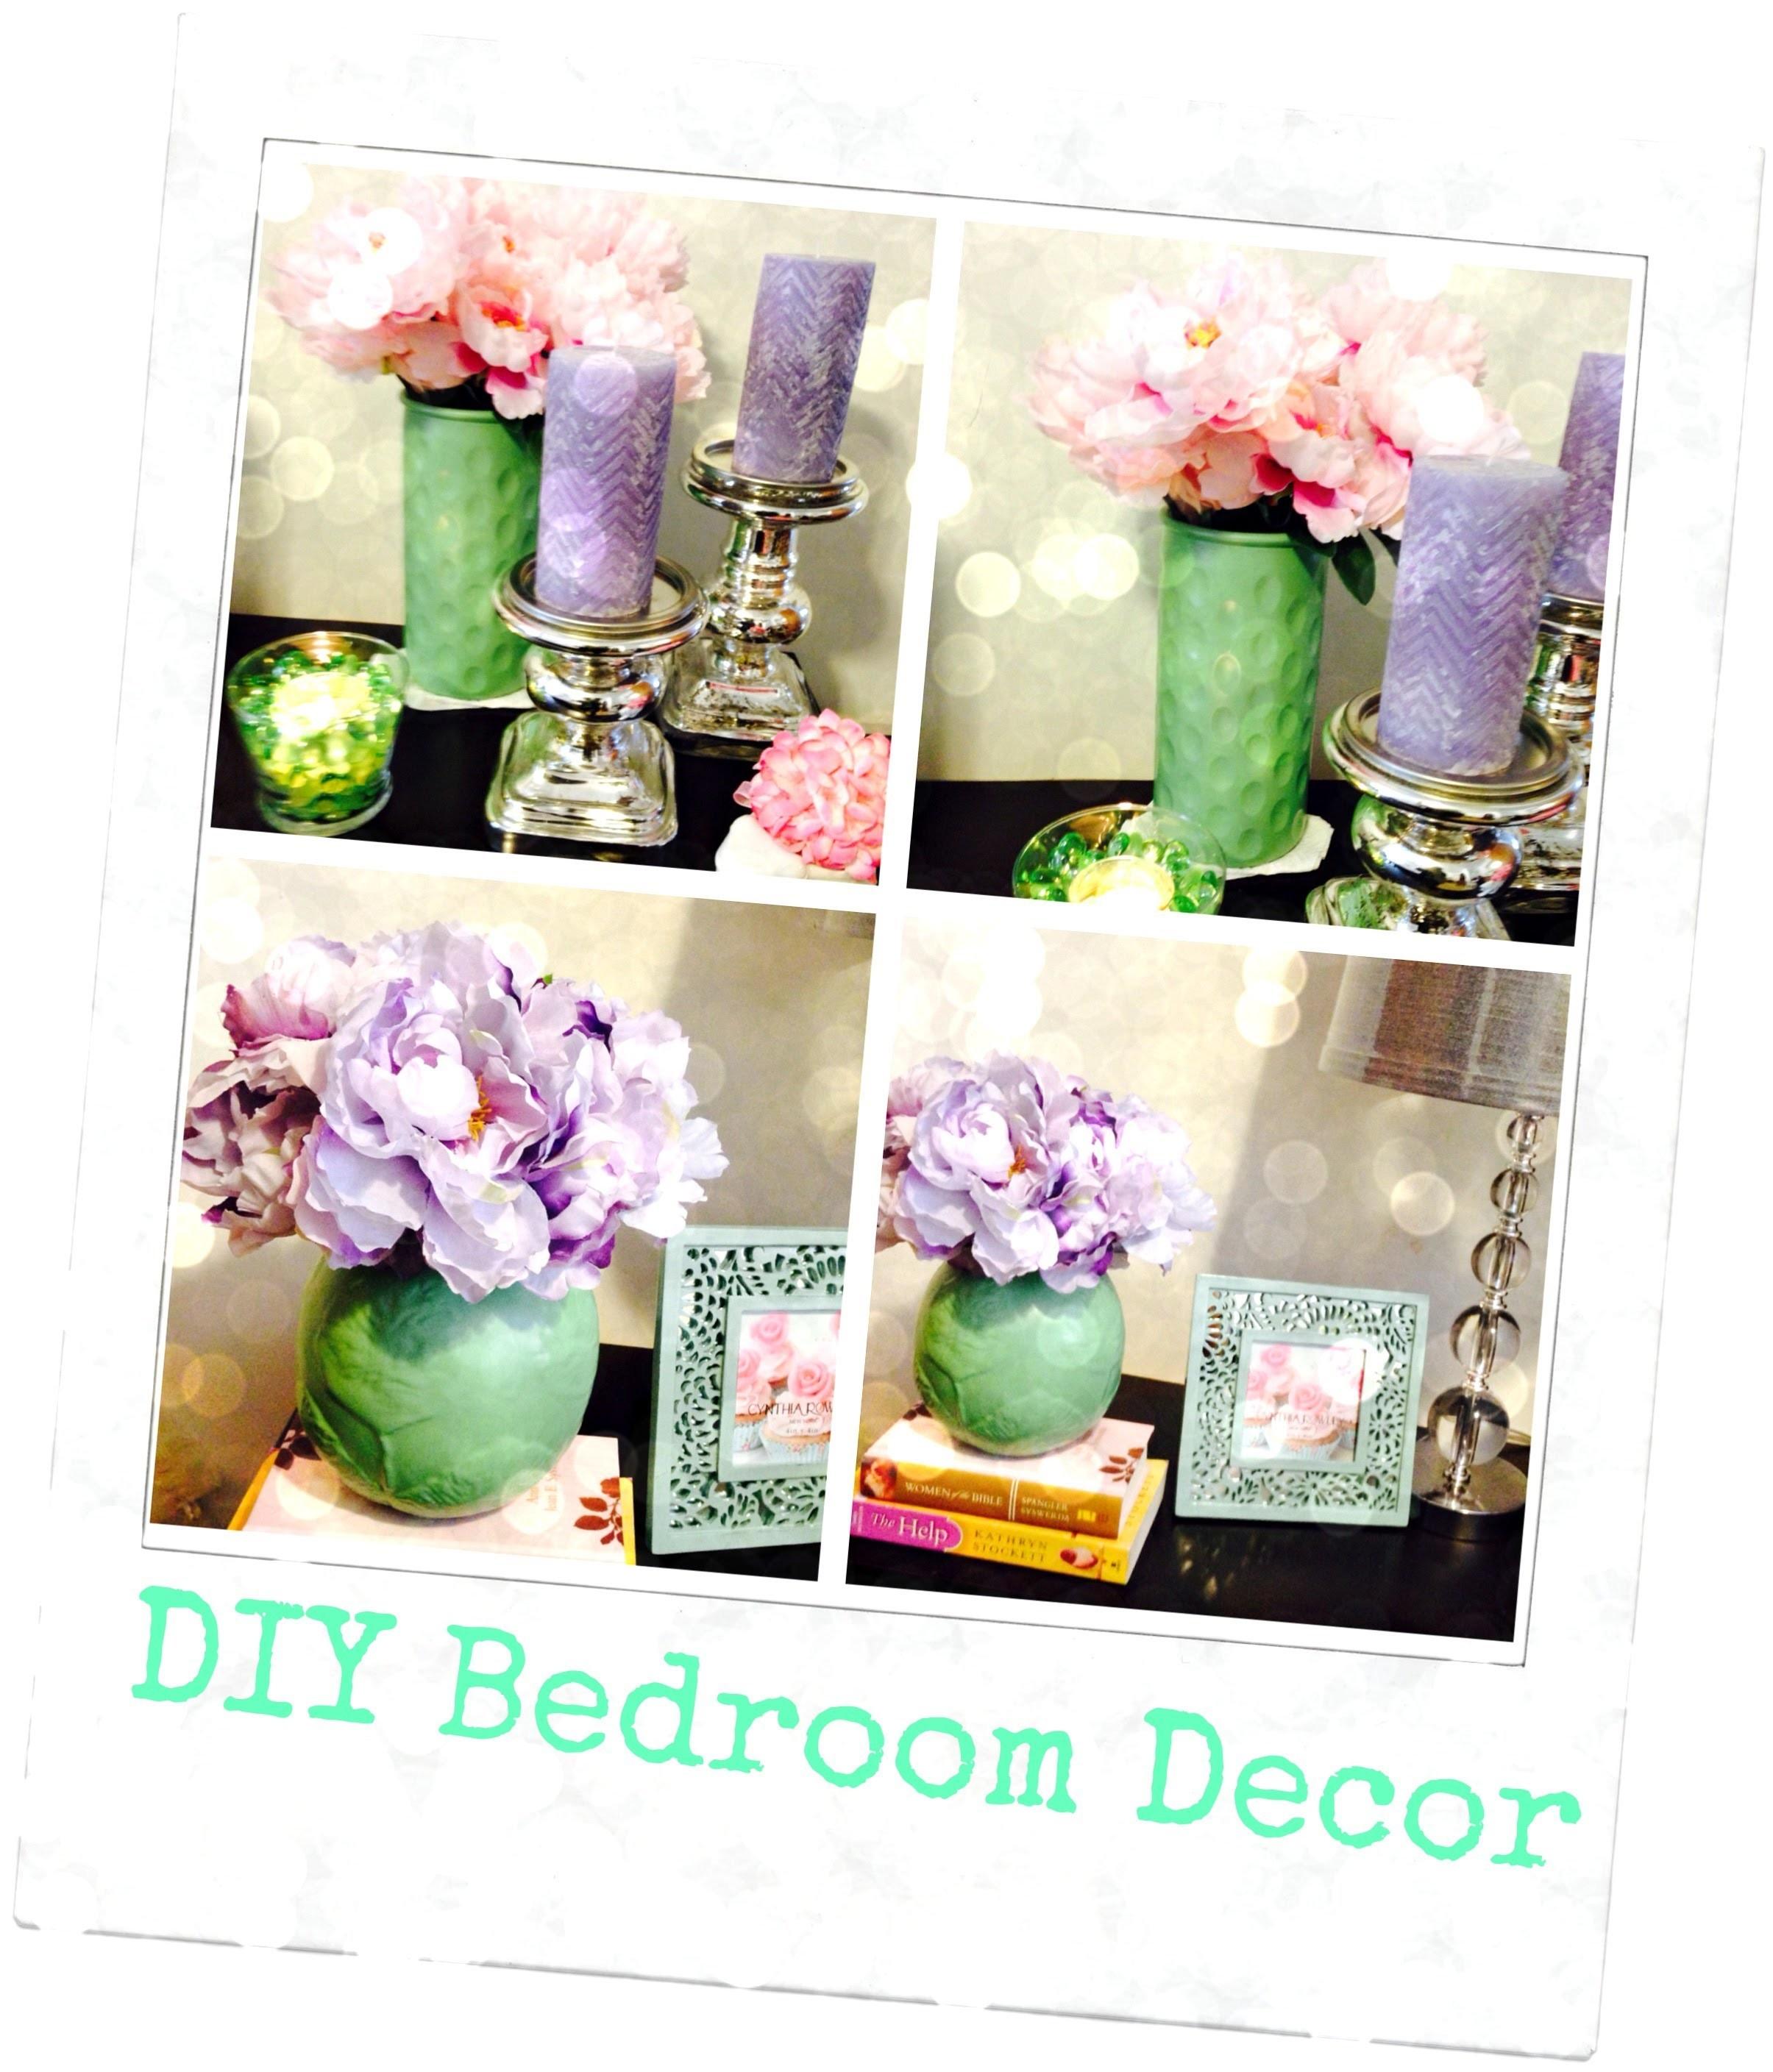 Diy With V Bedroom Decor